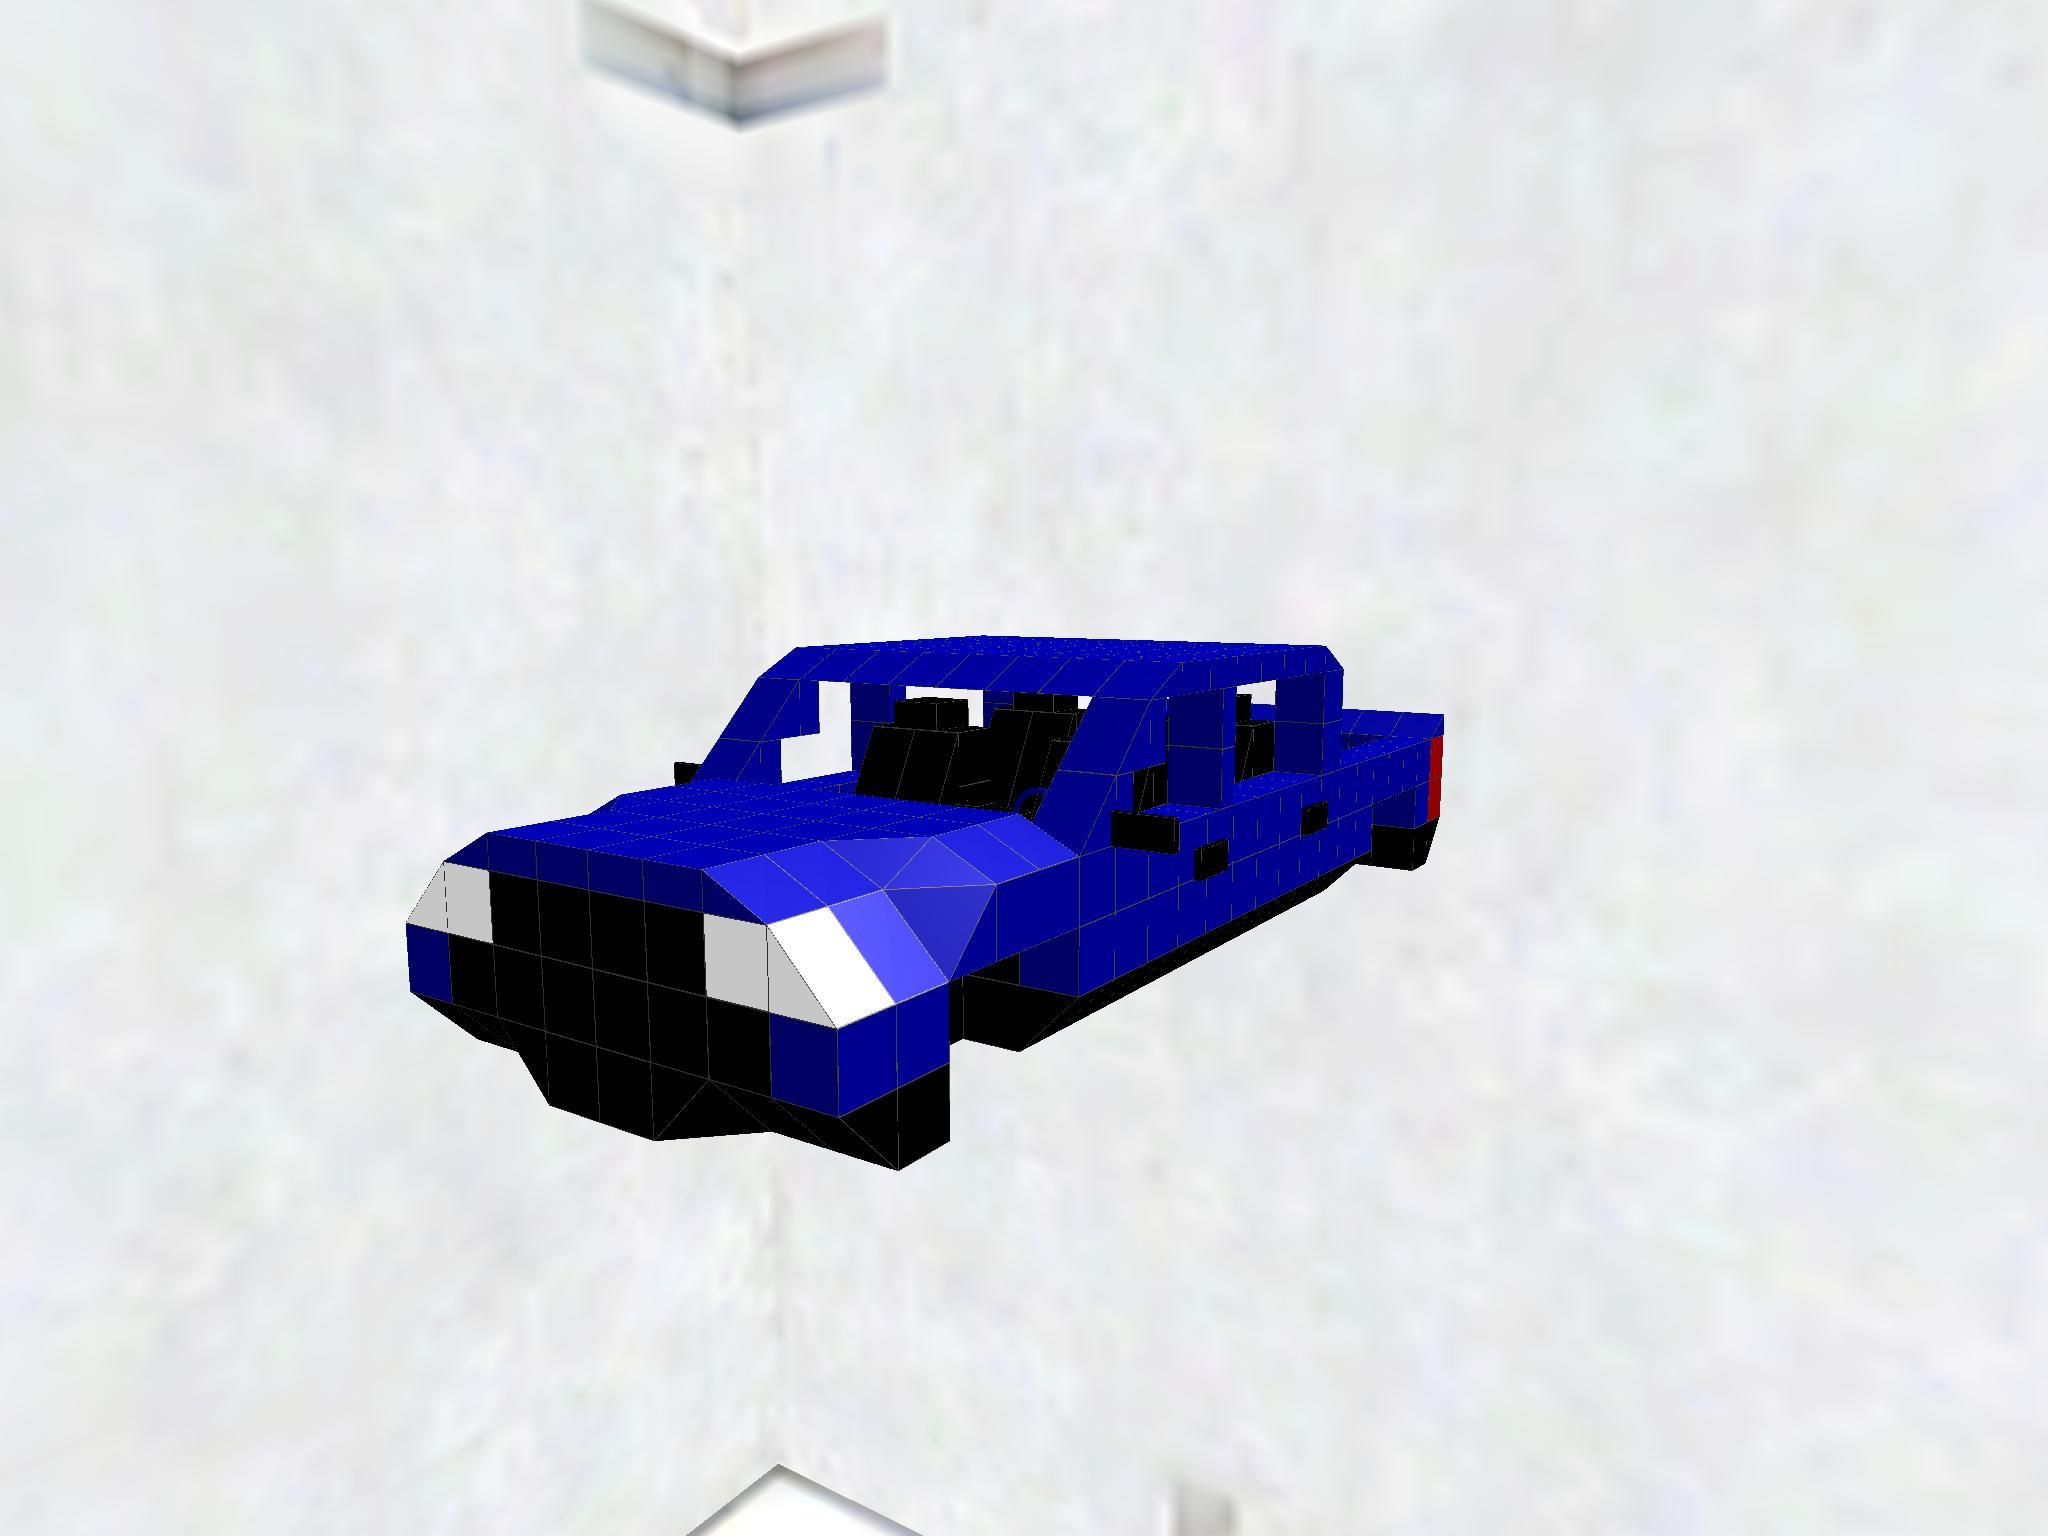 Diamond Lift 1500